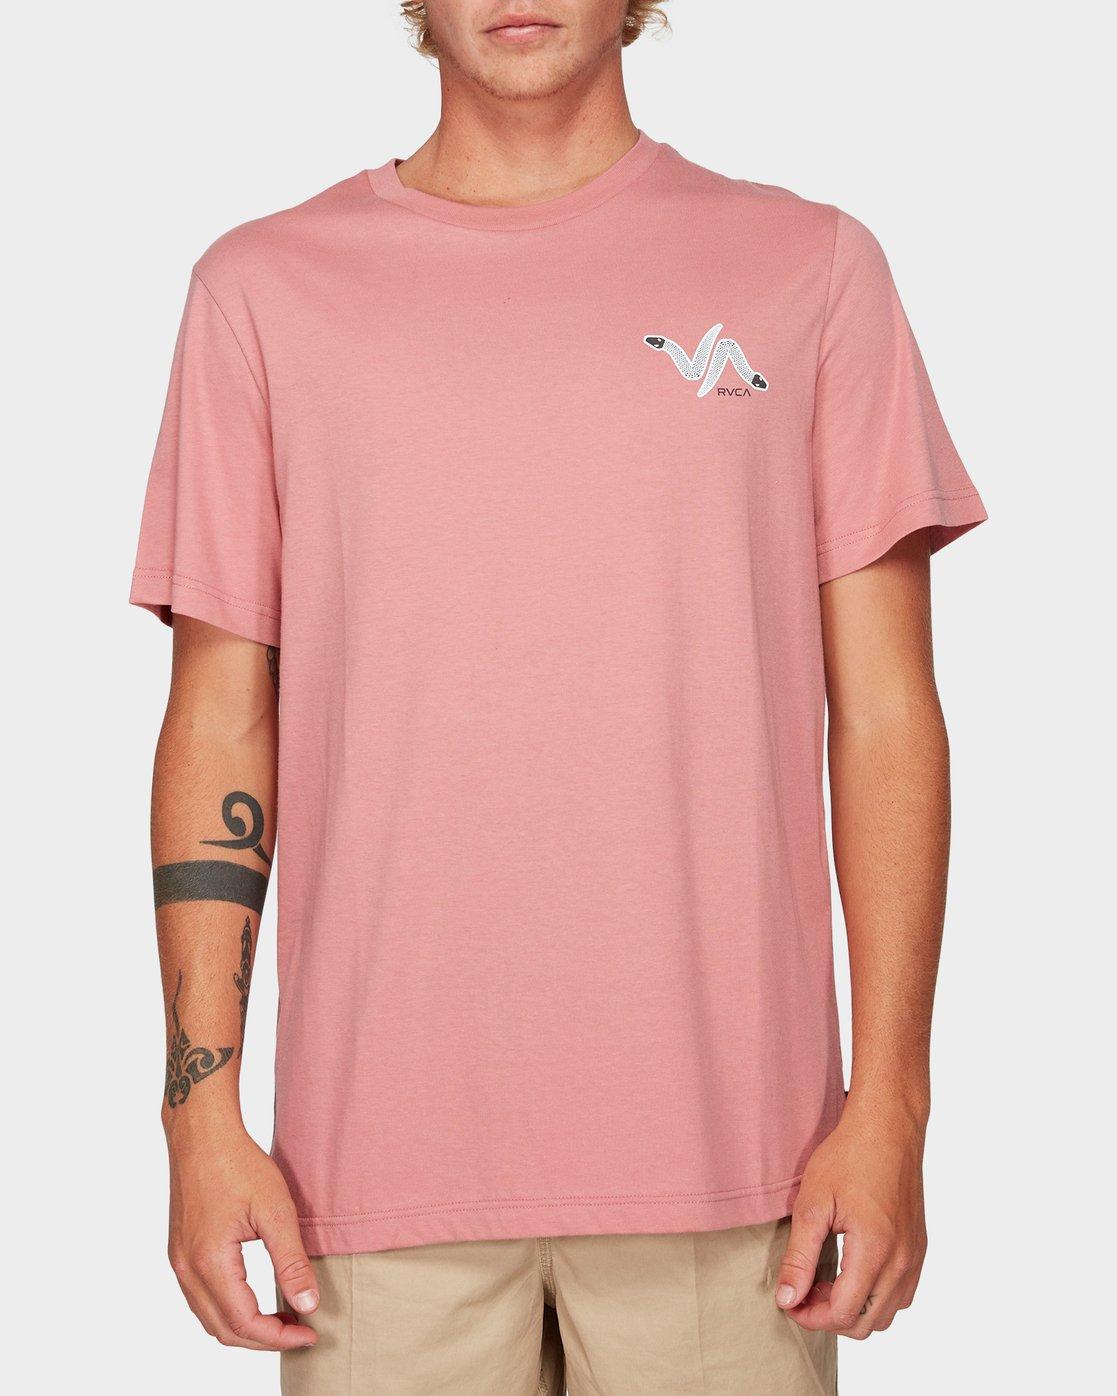 0 Snakey Snake Short Sleeve T-Shirt Pink R192055 RVCA